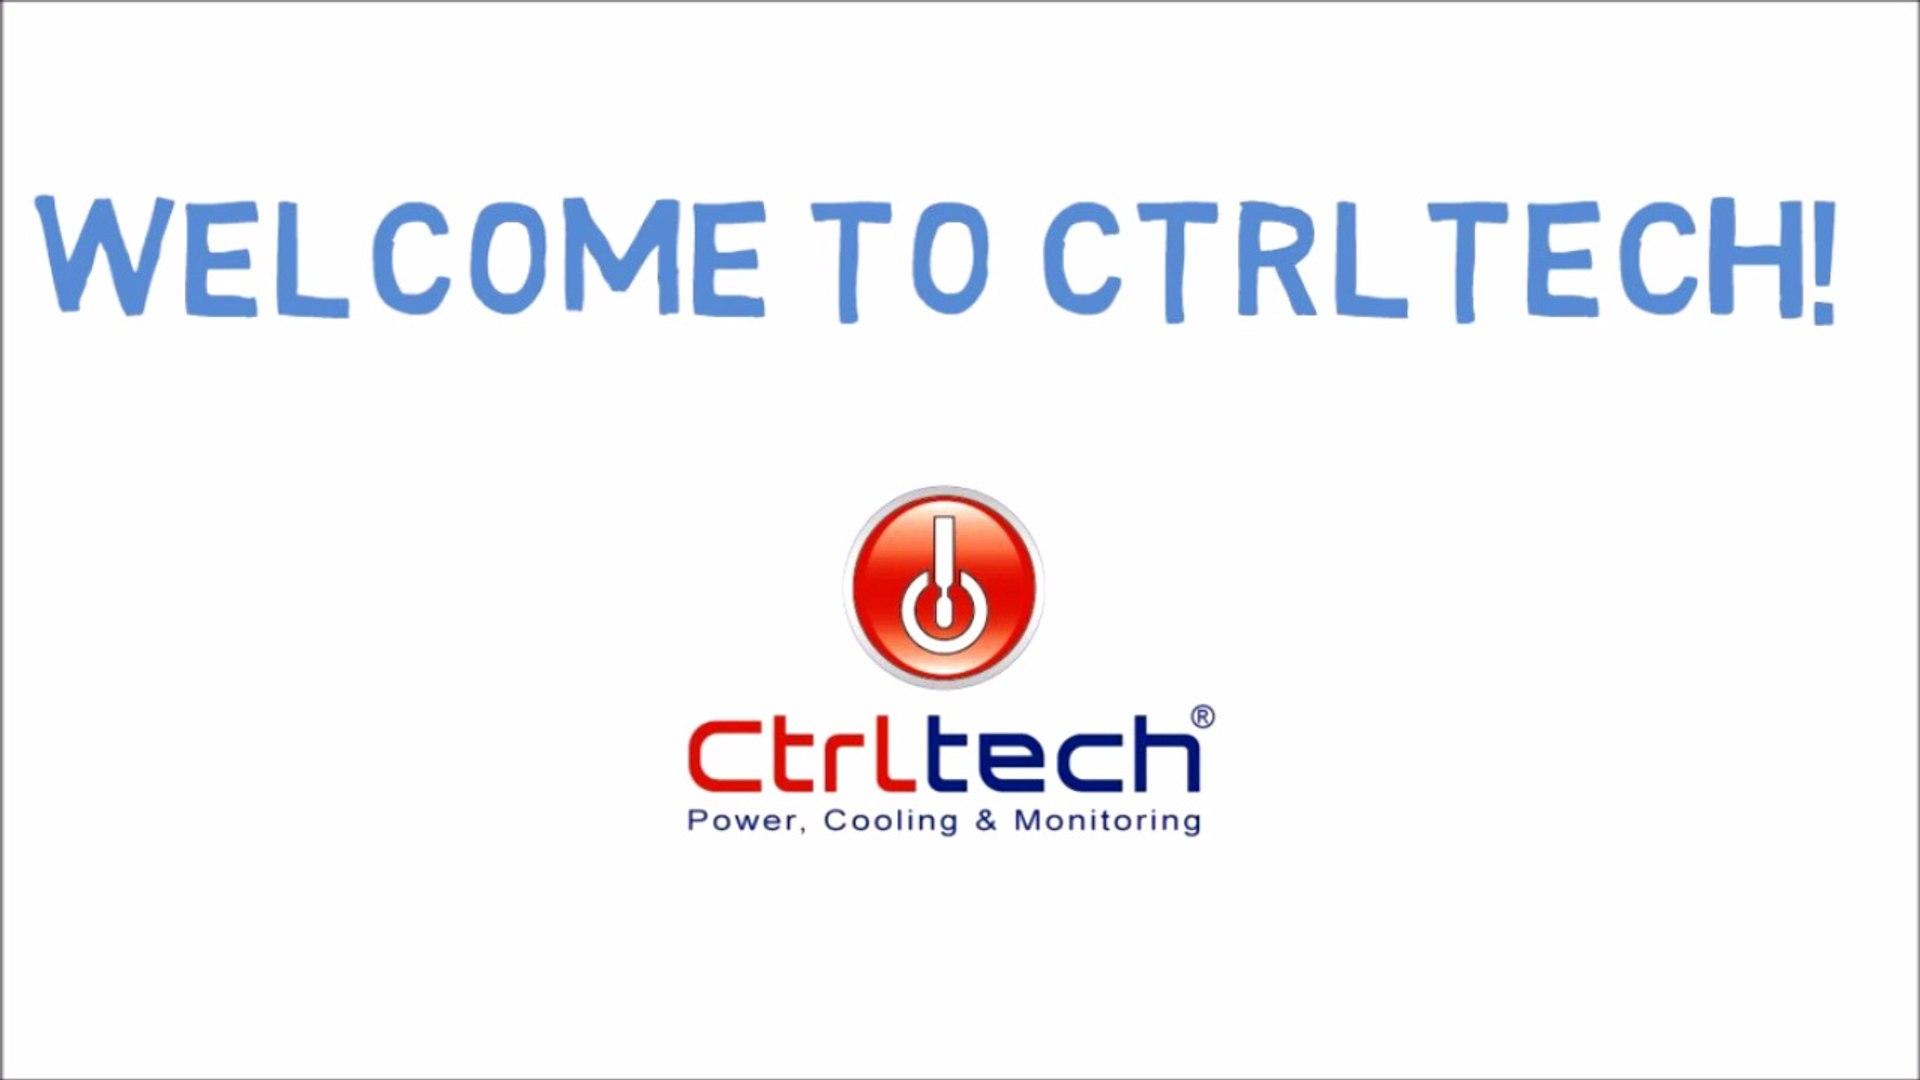 Control Technologies FZE (CtrlTech), Dubai, Sharjah, Abu Dhabi, UAE